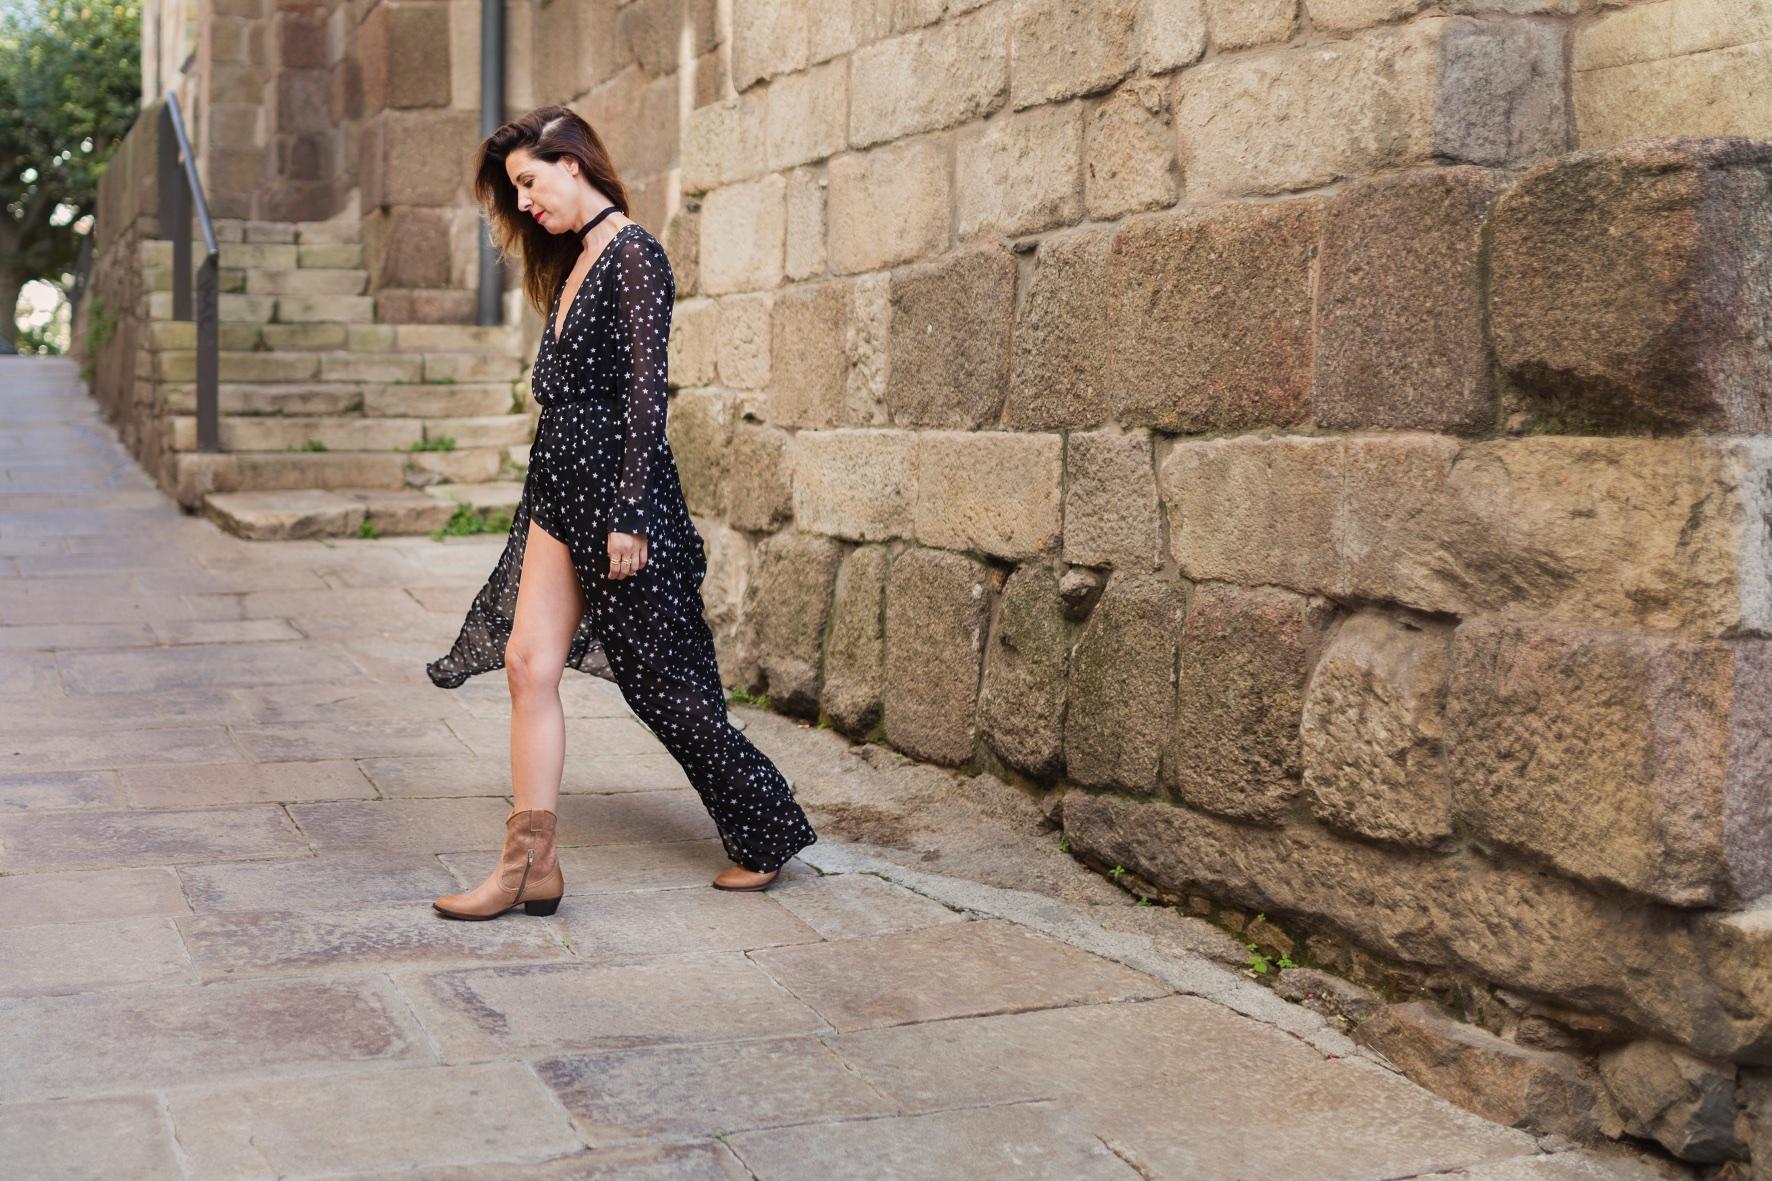 shein-dress-fashion-blogger-descalzaporelparque-1